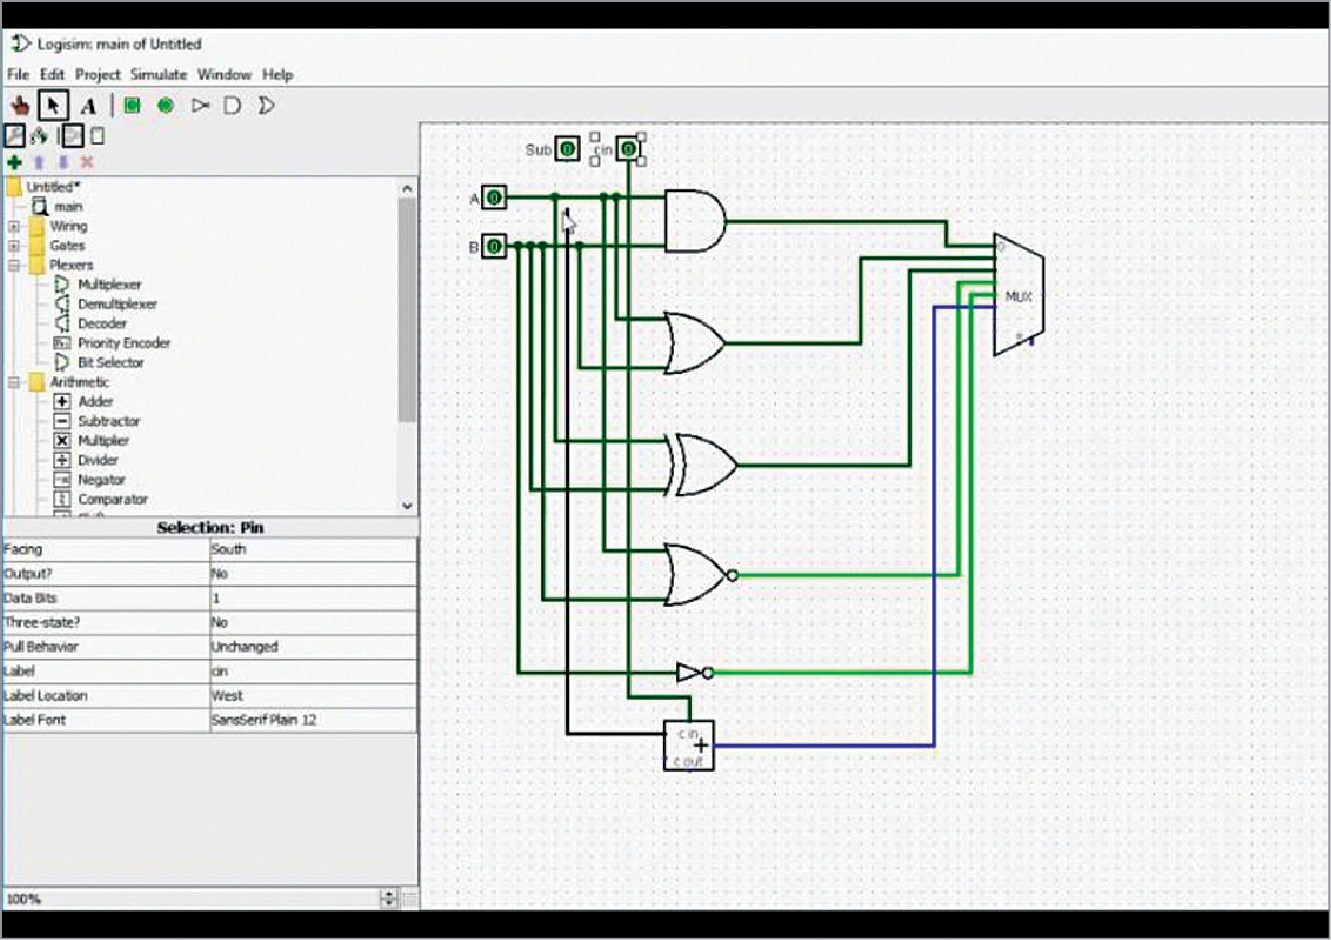 Logisim A User Friendly Logic Simulator Software Review Circuit Designing And Simulating Digital Logical Circuits